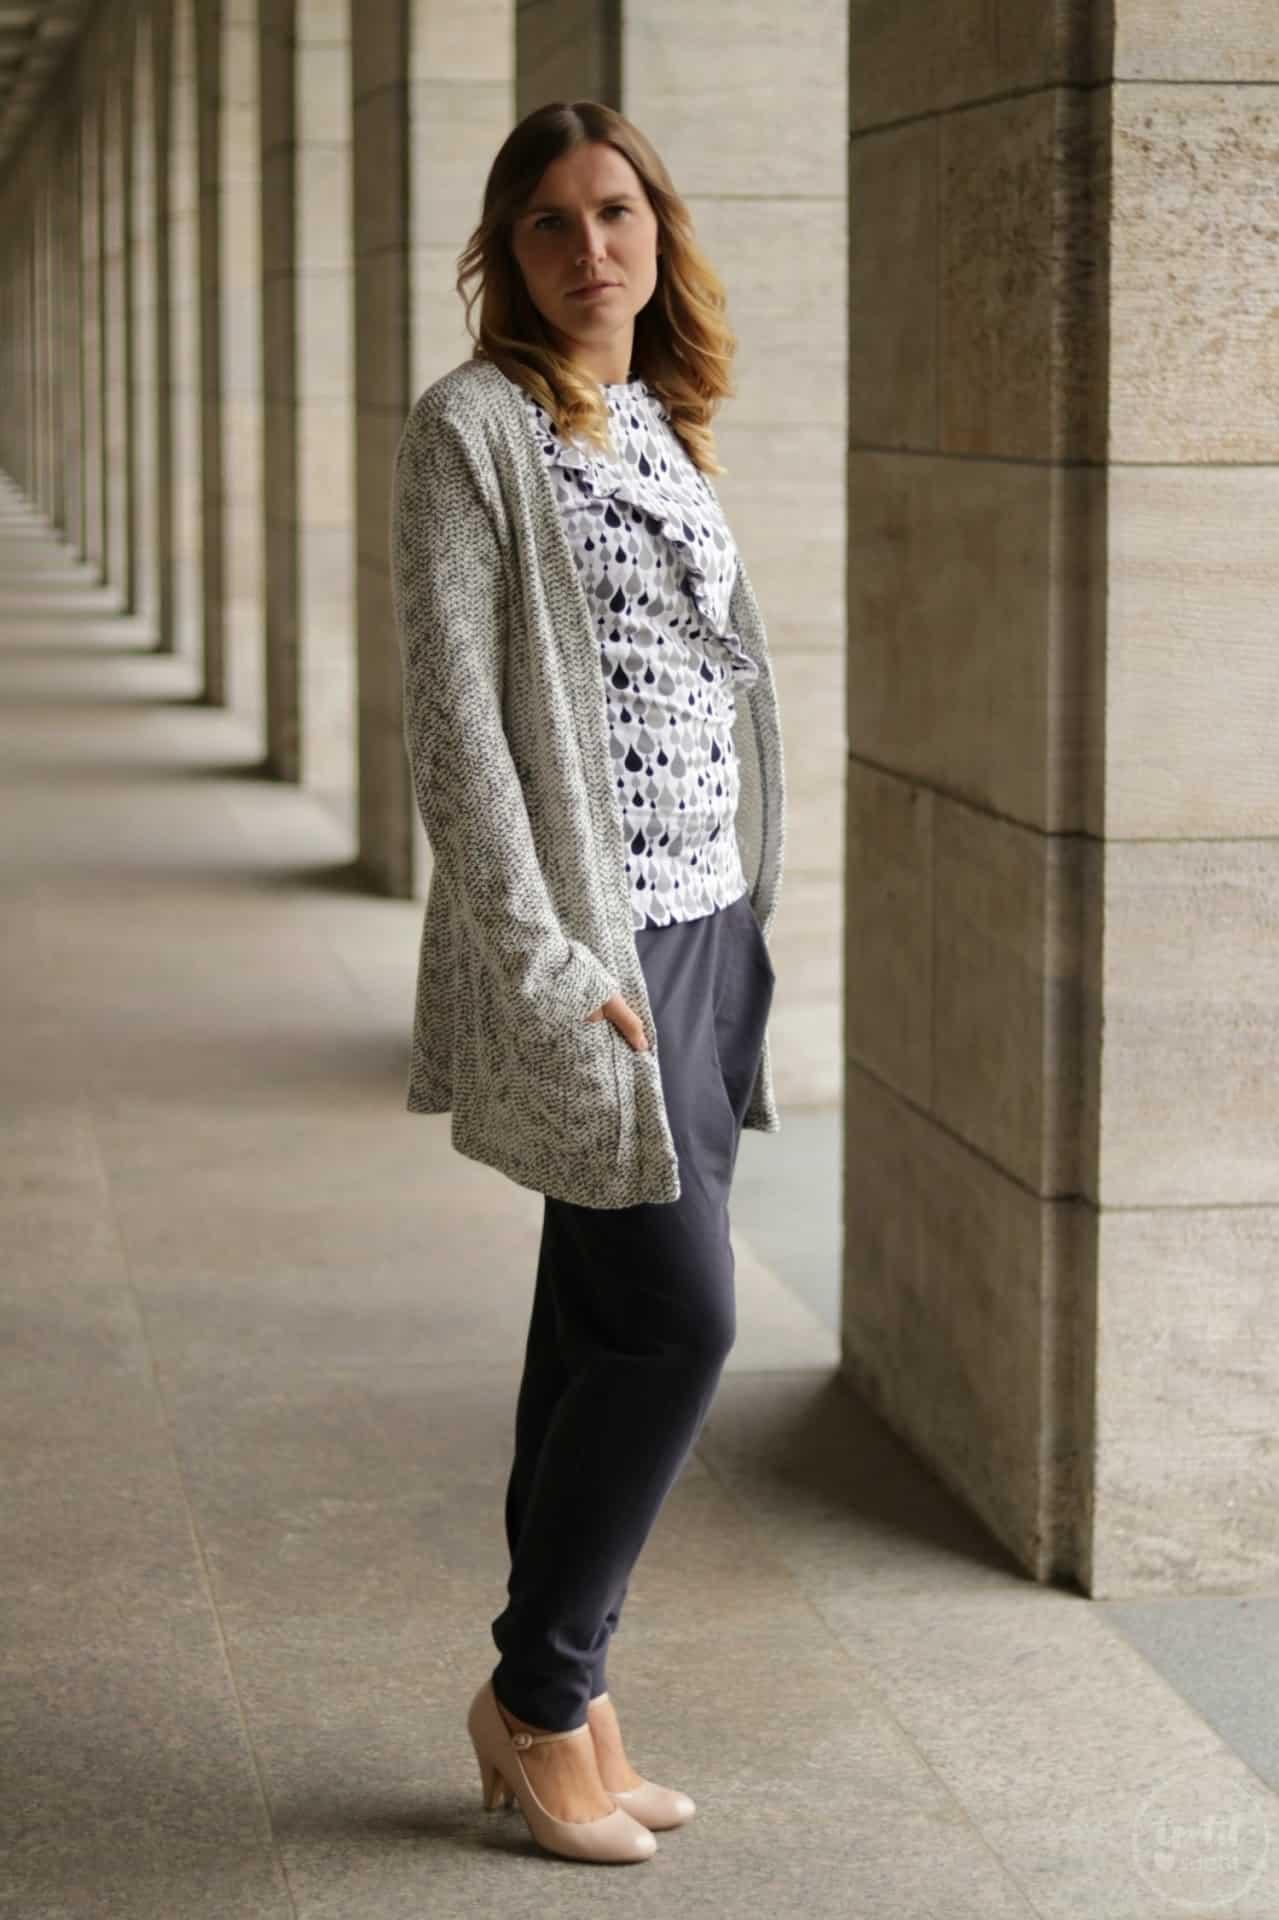 Schnittmuster kombinieren: Shirt Rüschli, Cardigan Lani und Hose Romana - Bild 4   textilsucht.de